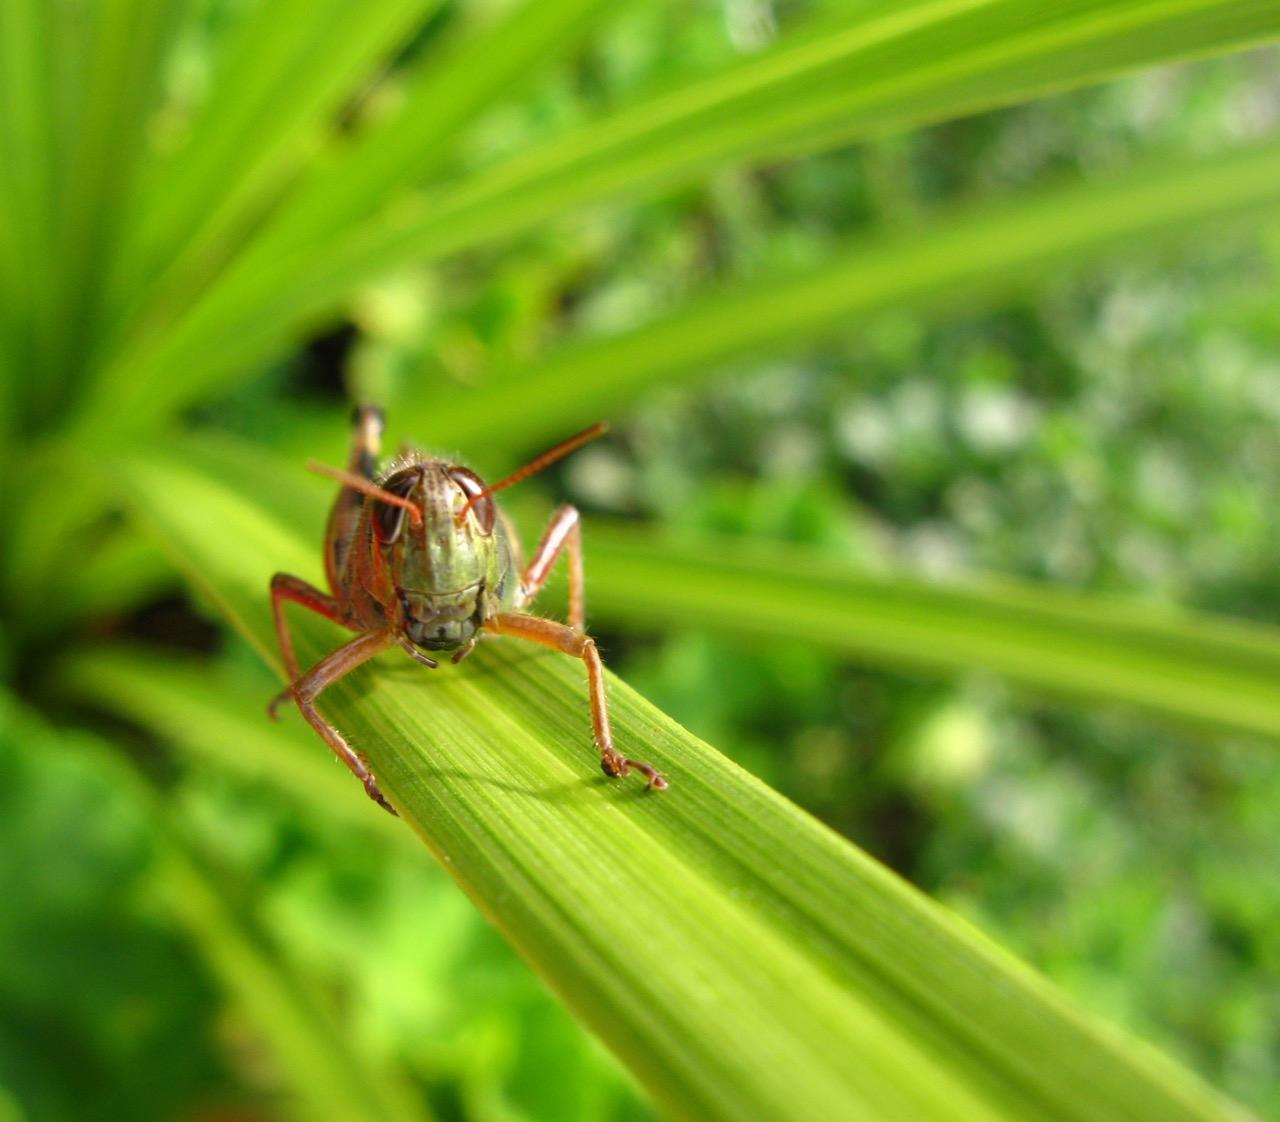 Grasshopper by Michelle Maggs